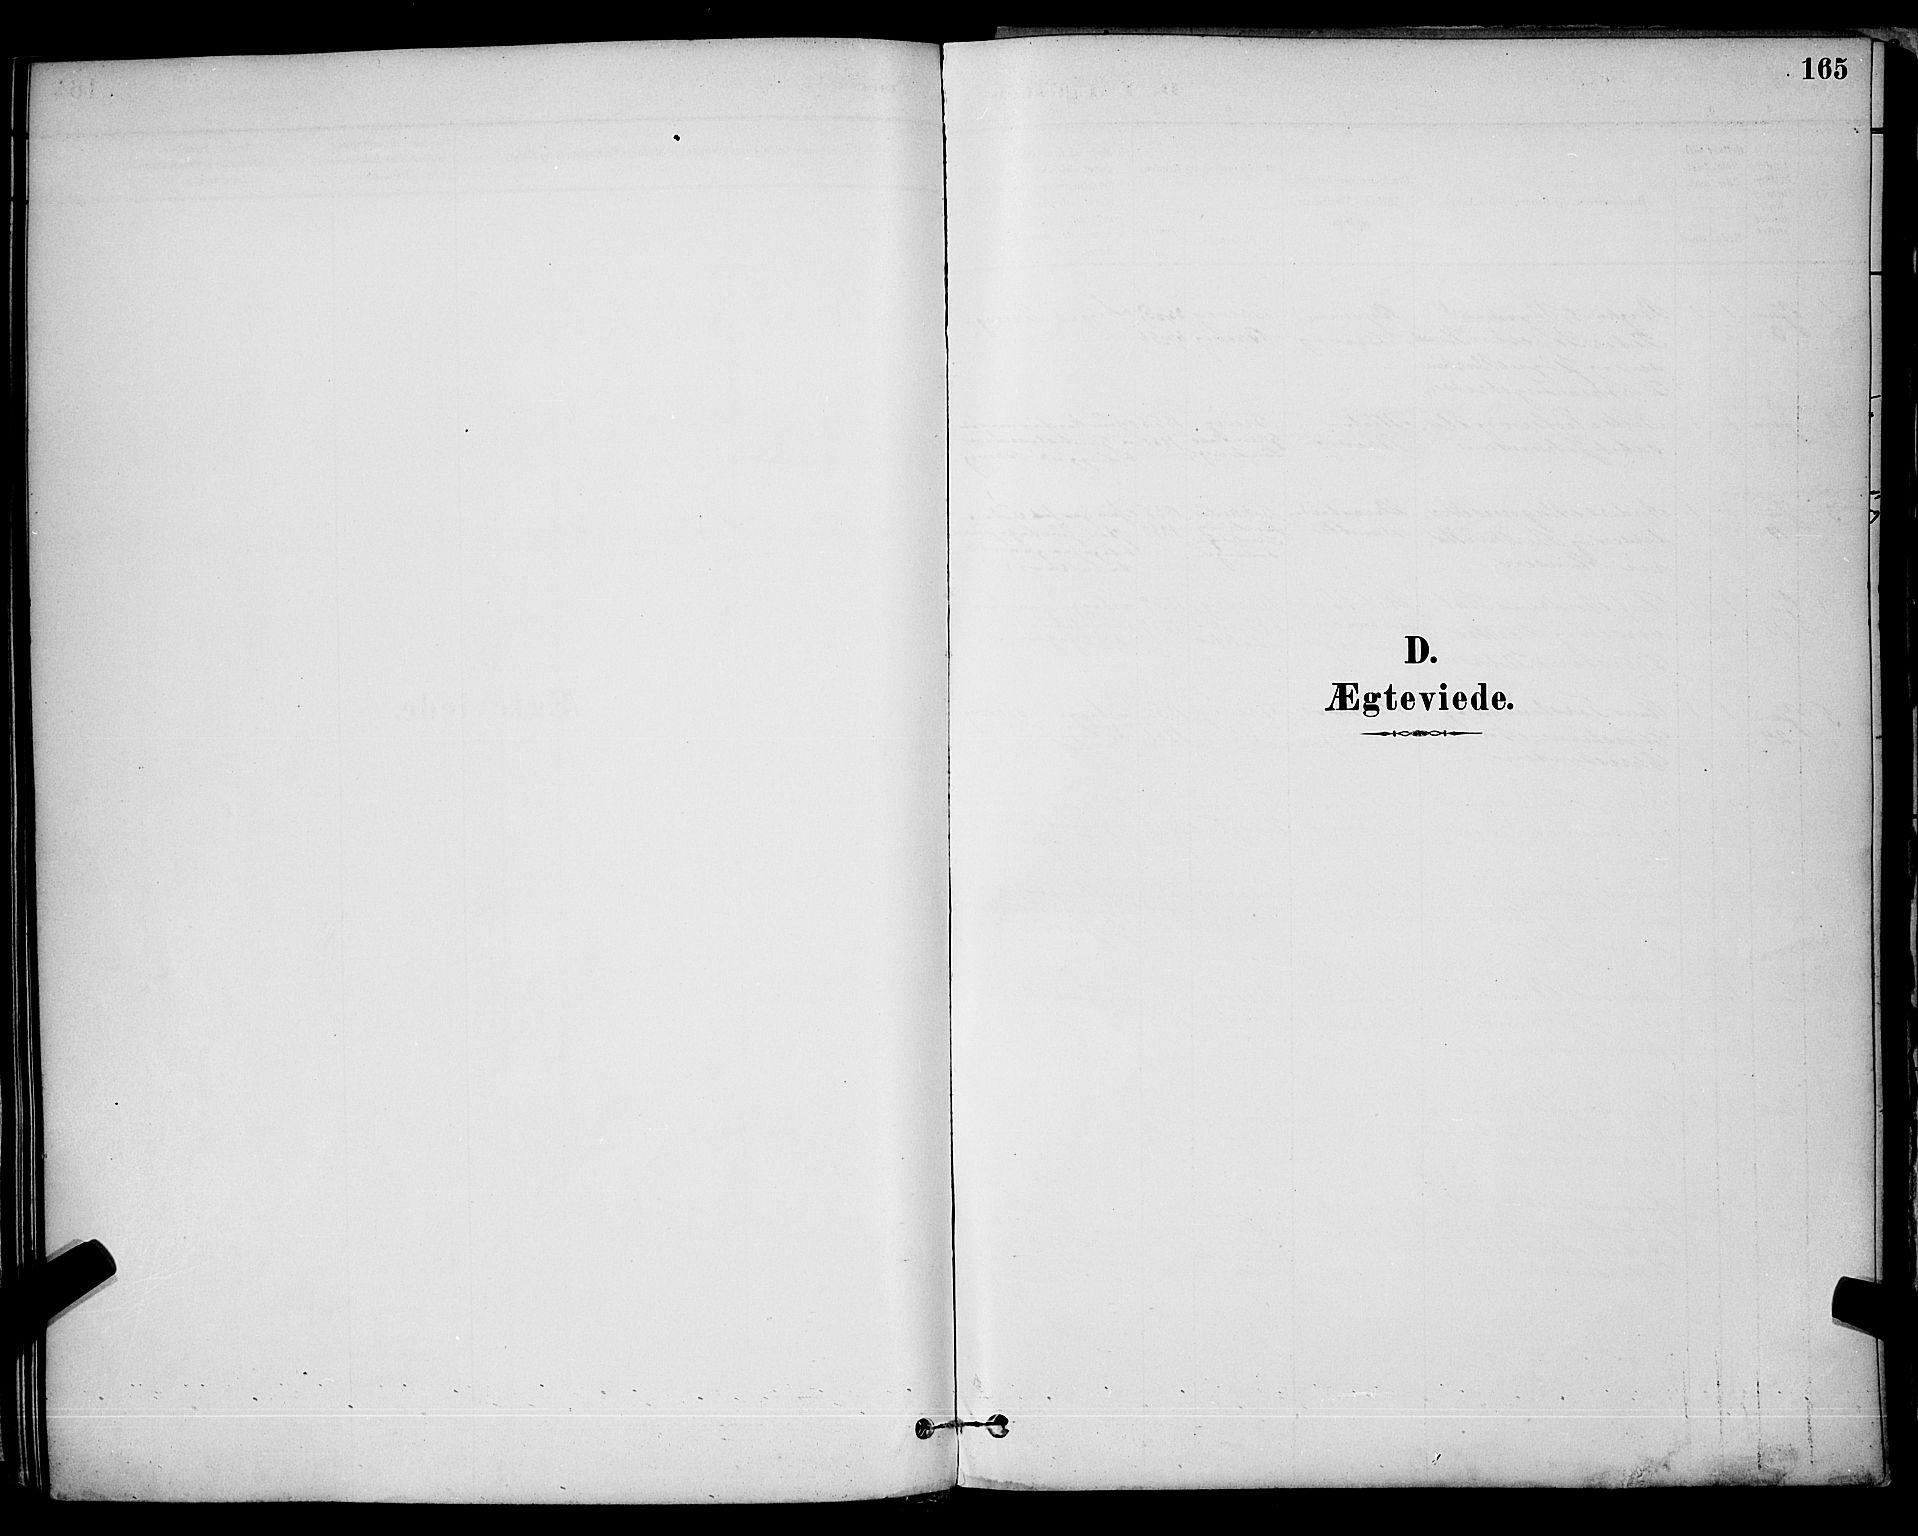 SAKO, Brevik kirkebøker, G/Ga/L0004: Klokkerbok nr. 4, 1882-1900, s. 165